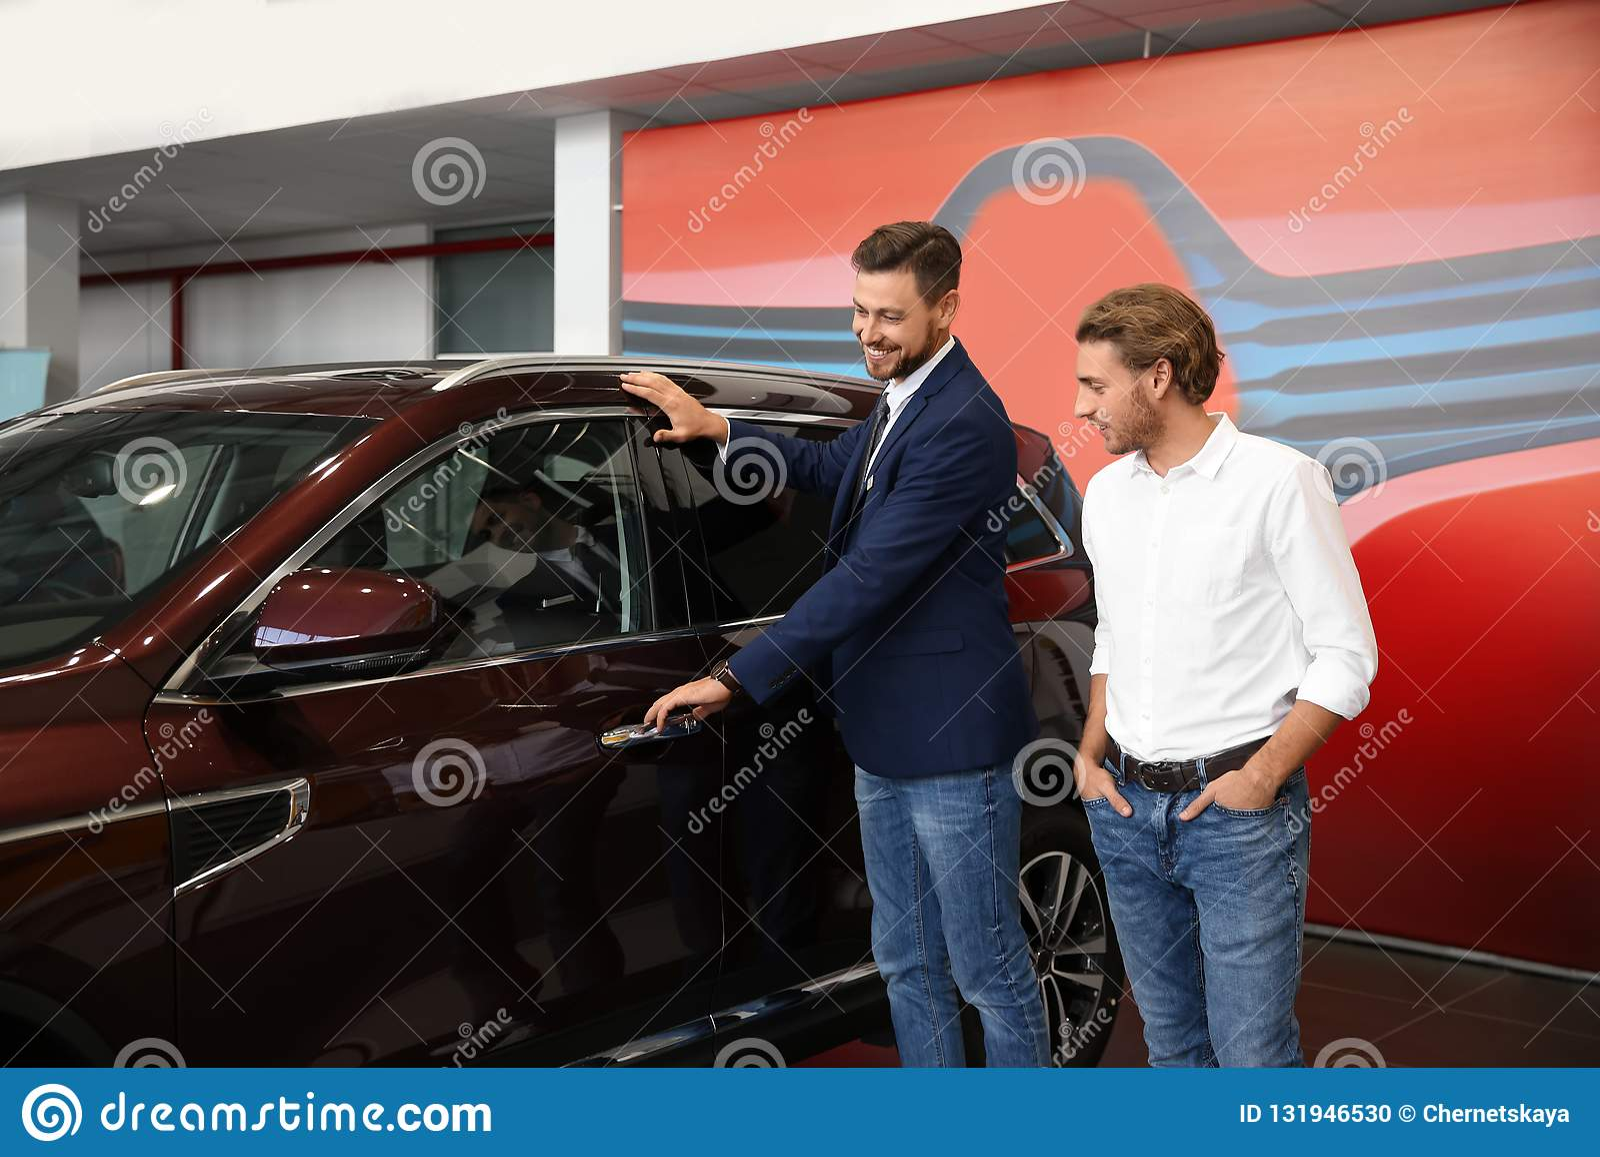 Salesman with customer in modern car